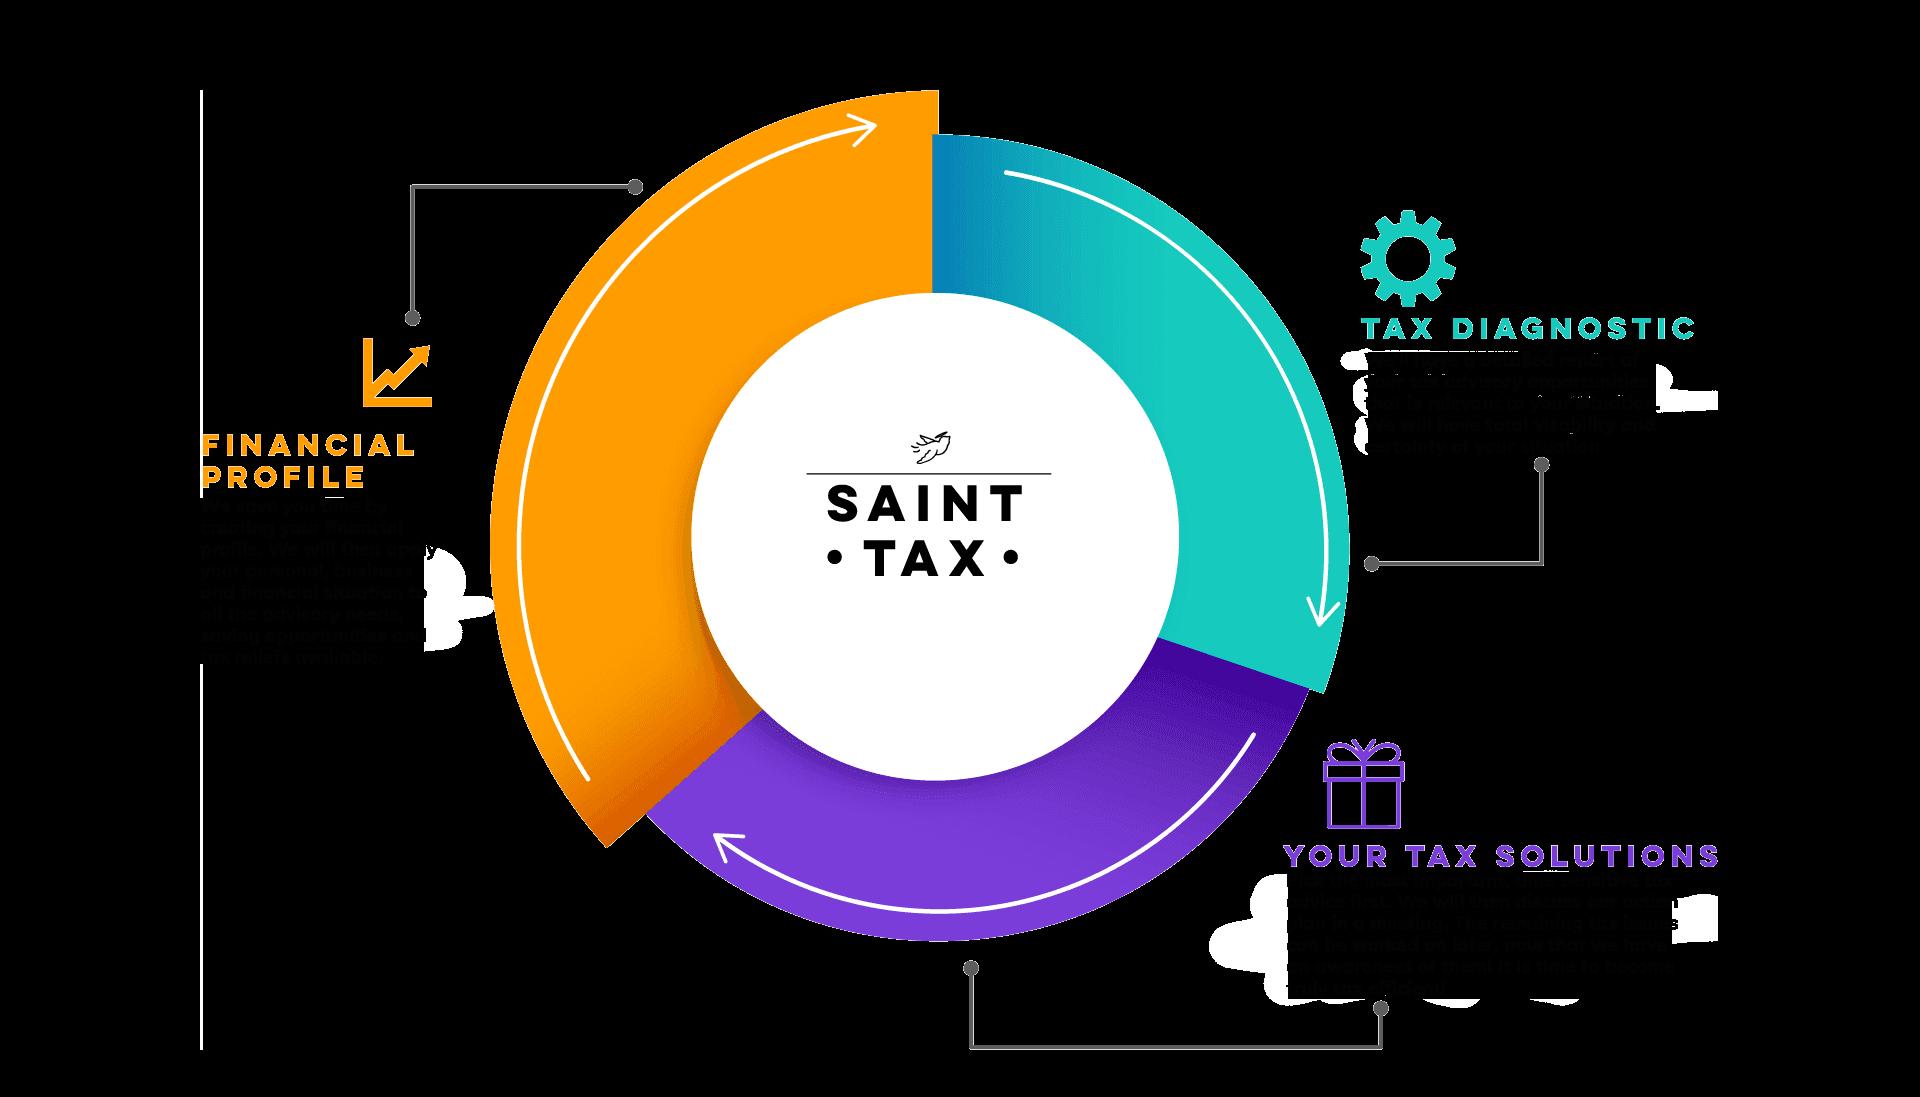 Saint Tax Cycle